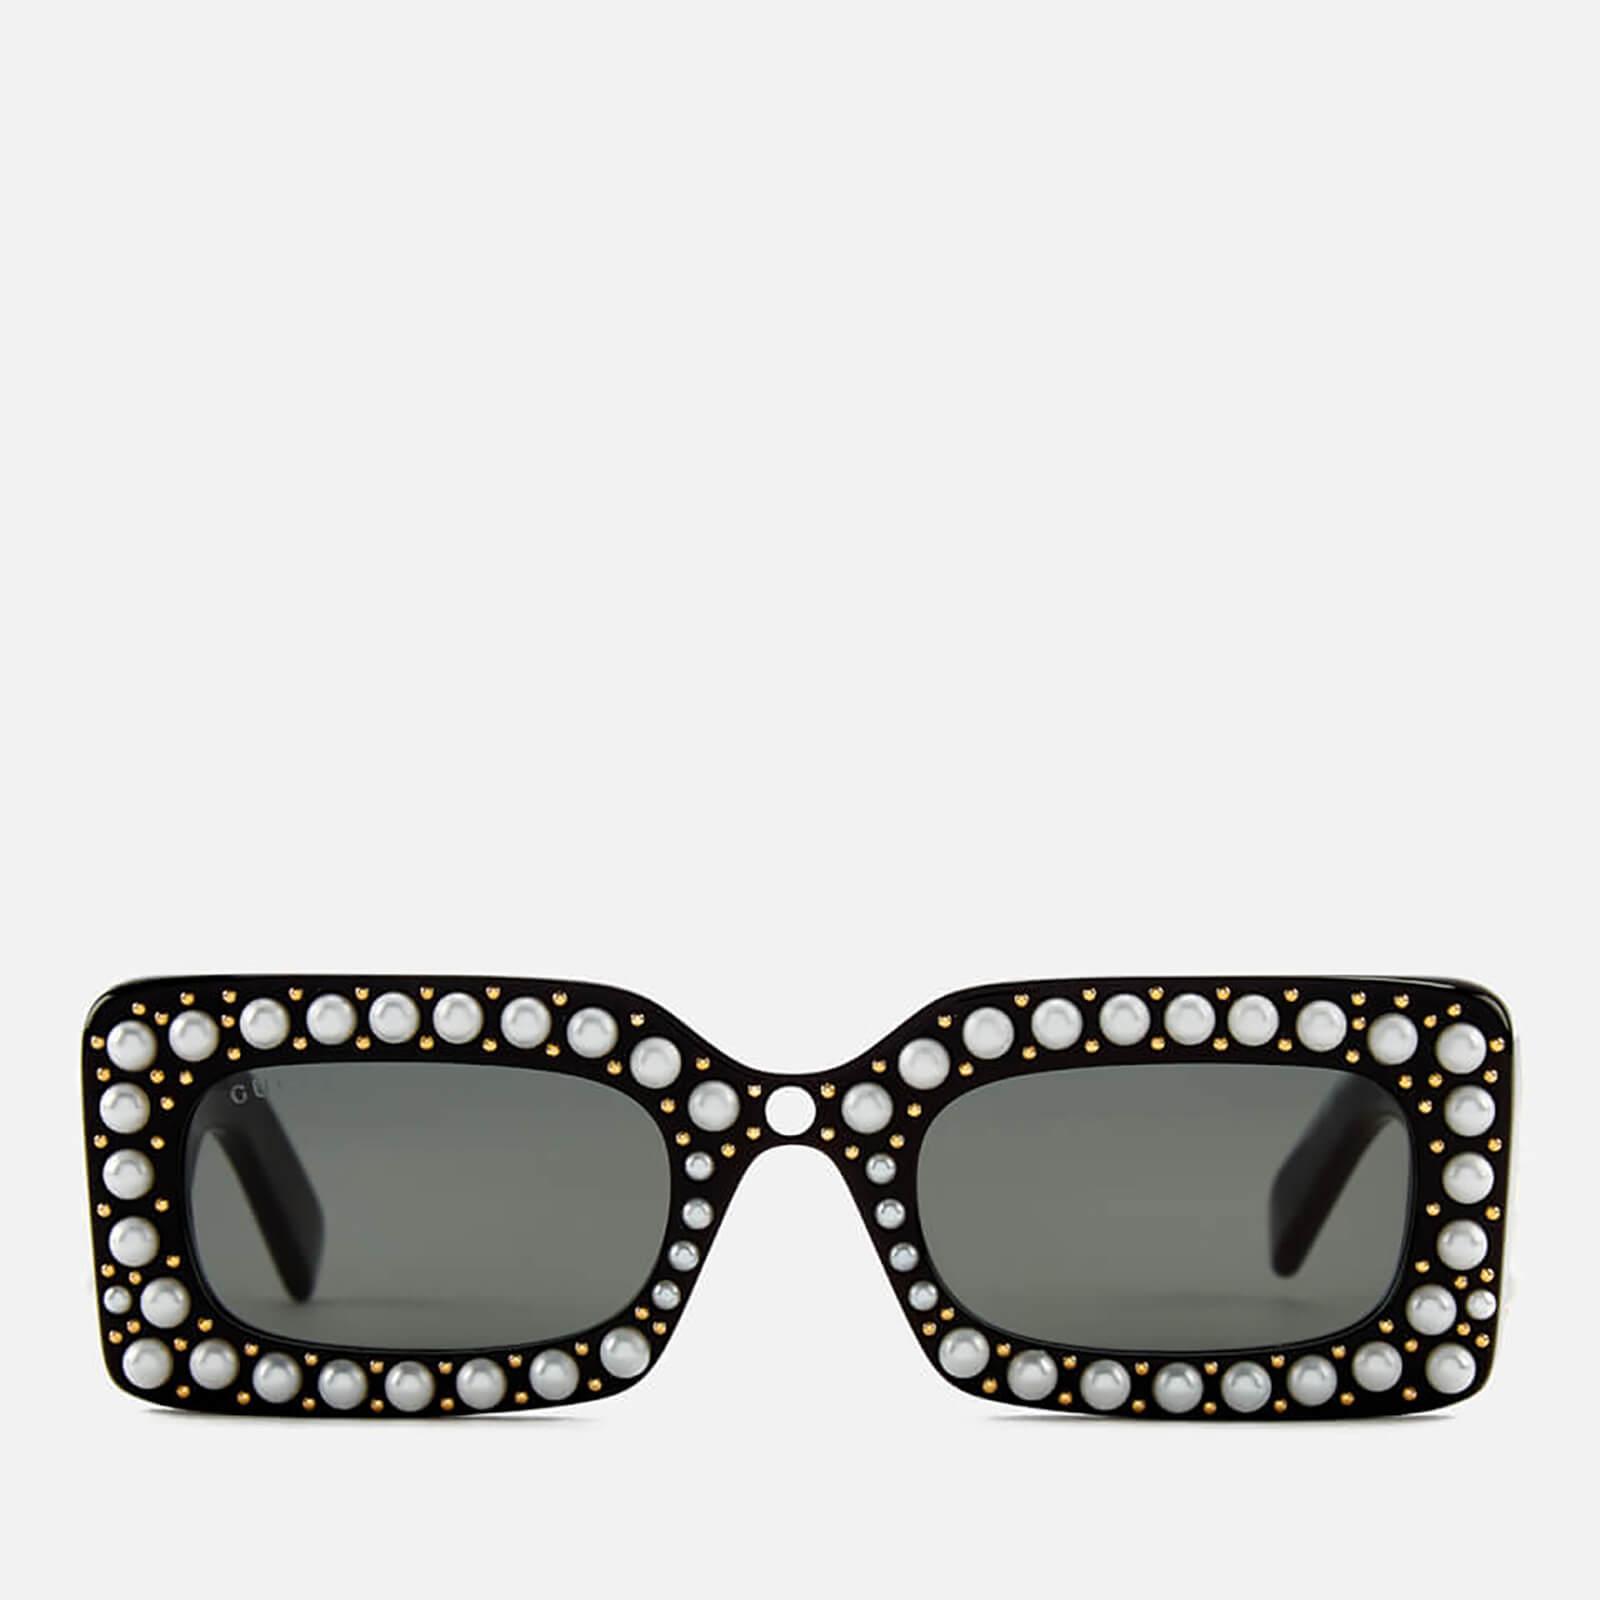 35682166217 Gucci Women's Pearl Square Sunglasses - Black/Grey - Free UK Delivery over  £50